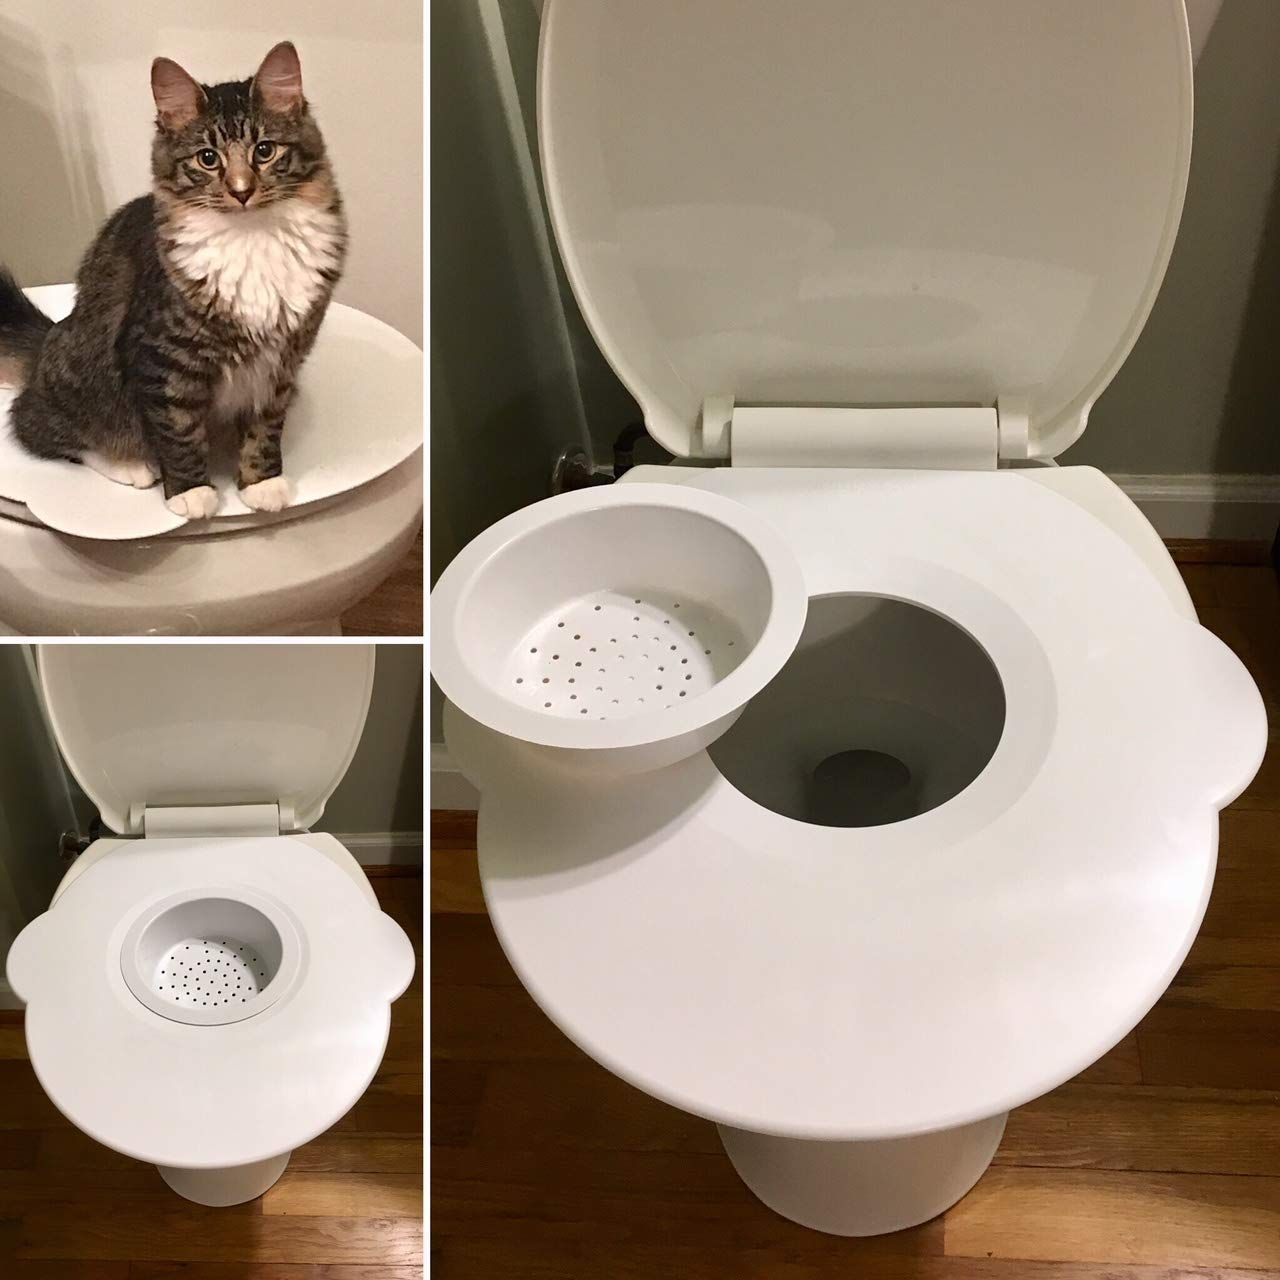 Kitty S Loo The Best Cat Toilet Seat Cat Toilet Training Kit